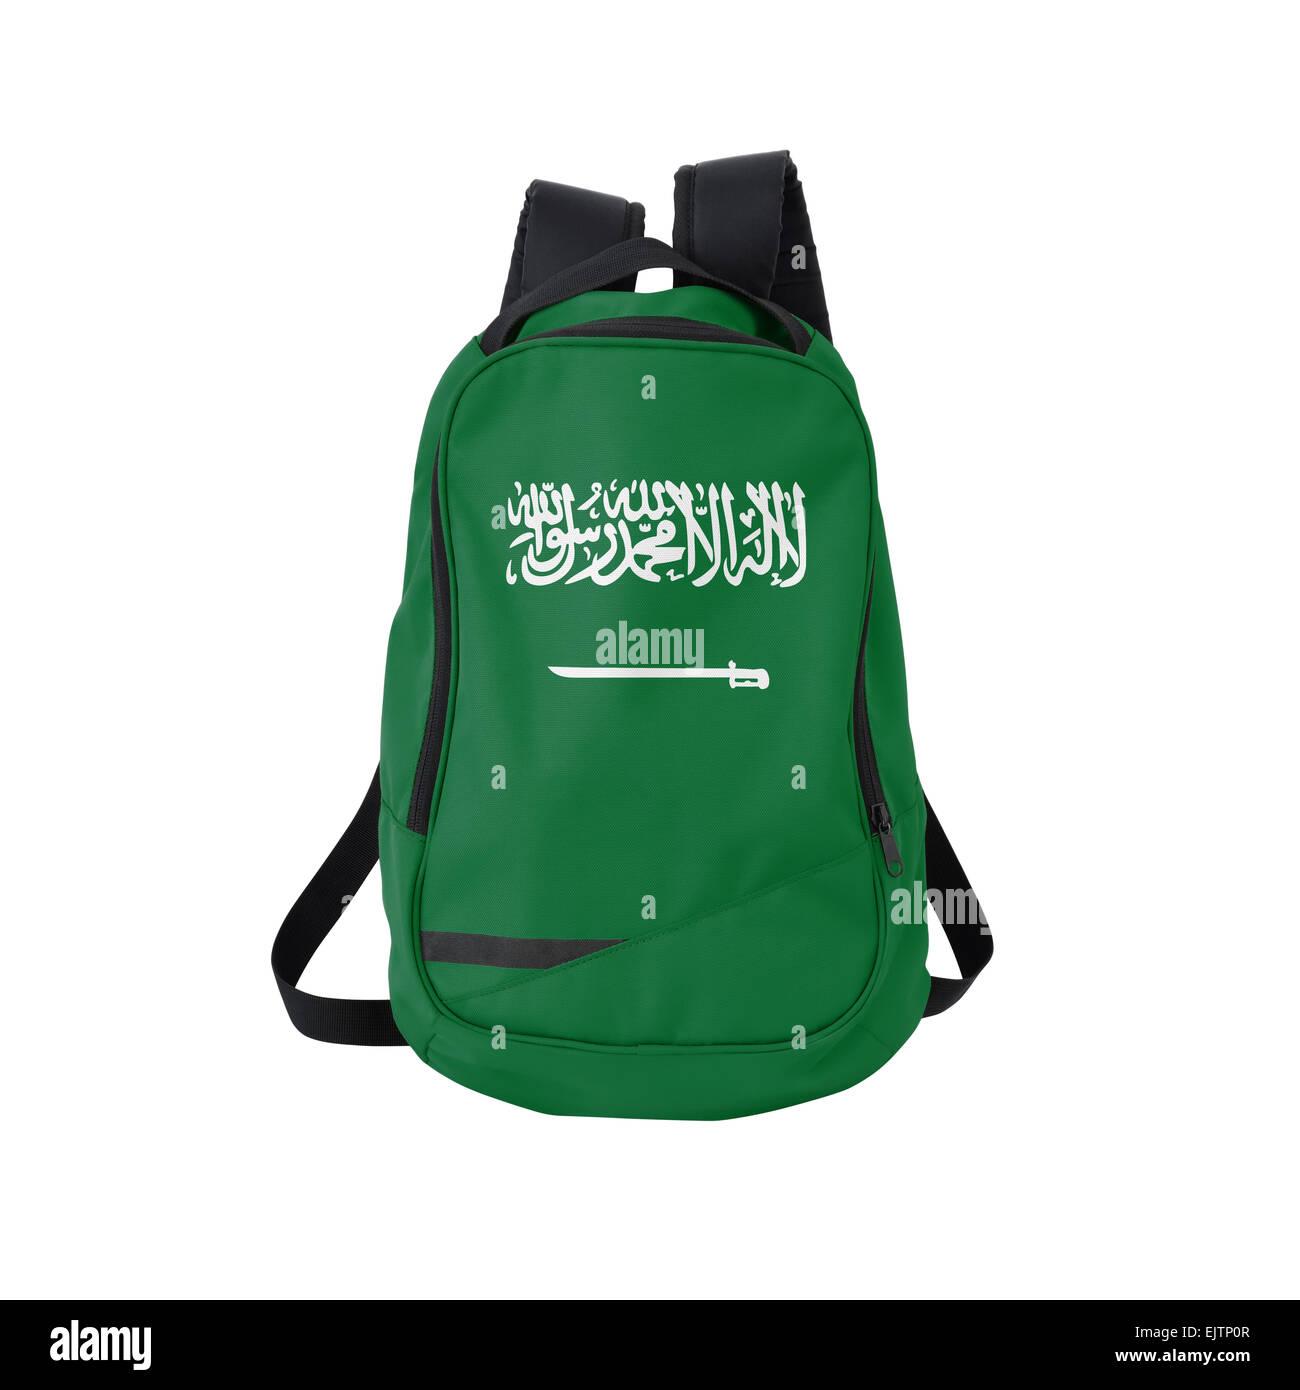 Saudi Arabian Flag Imágenes De Stock & Saudi Arabian Flag Fotos De ...